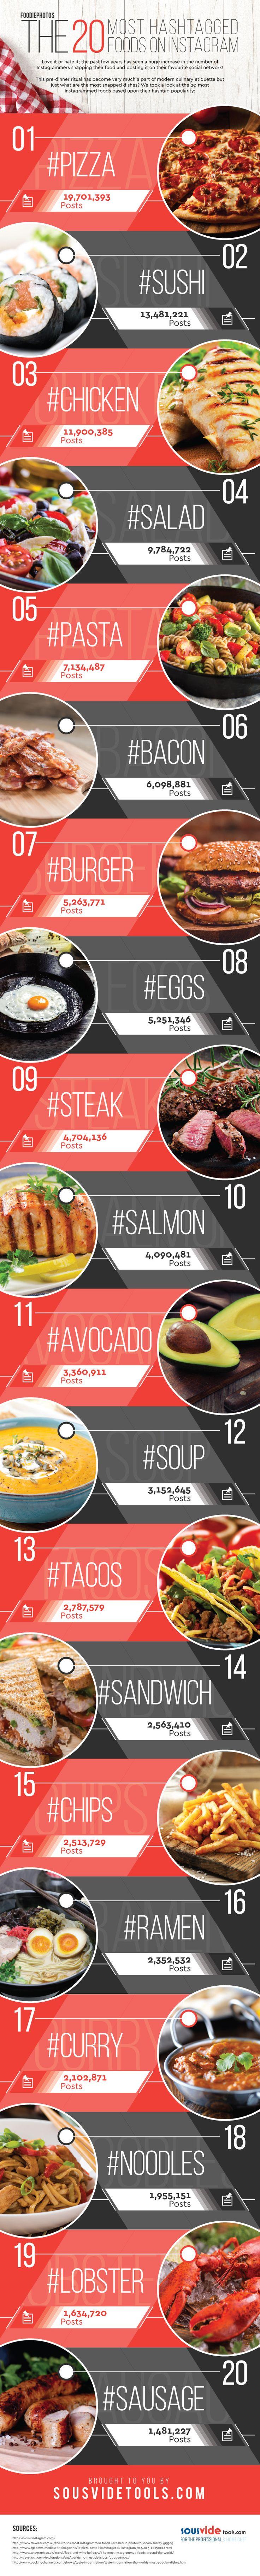 20-most-instagrammed-foods1